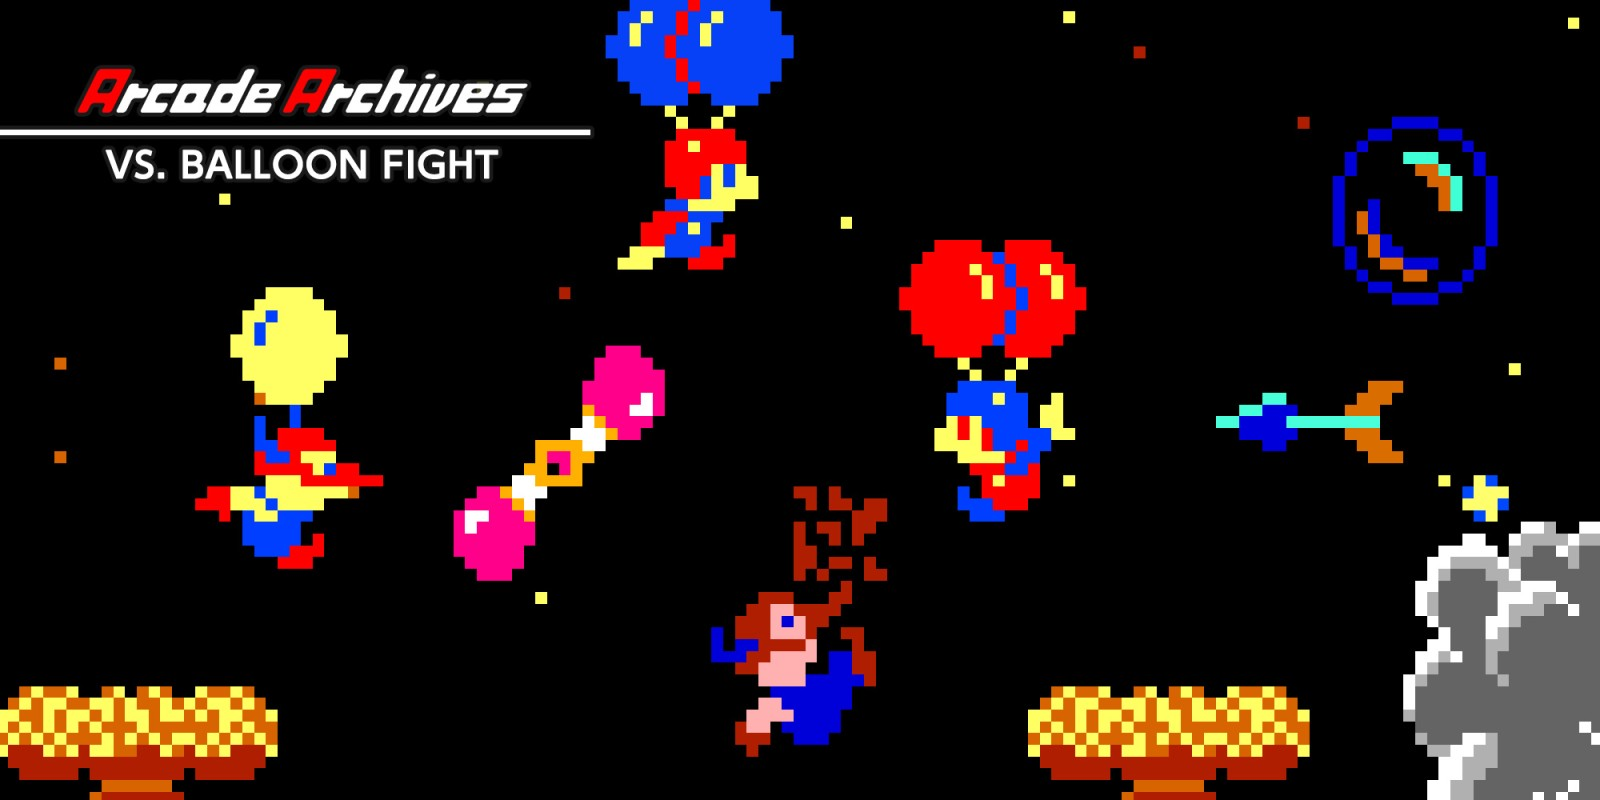 Arcade Archives VS. BALLOON FIGHT